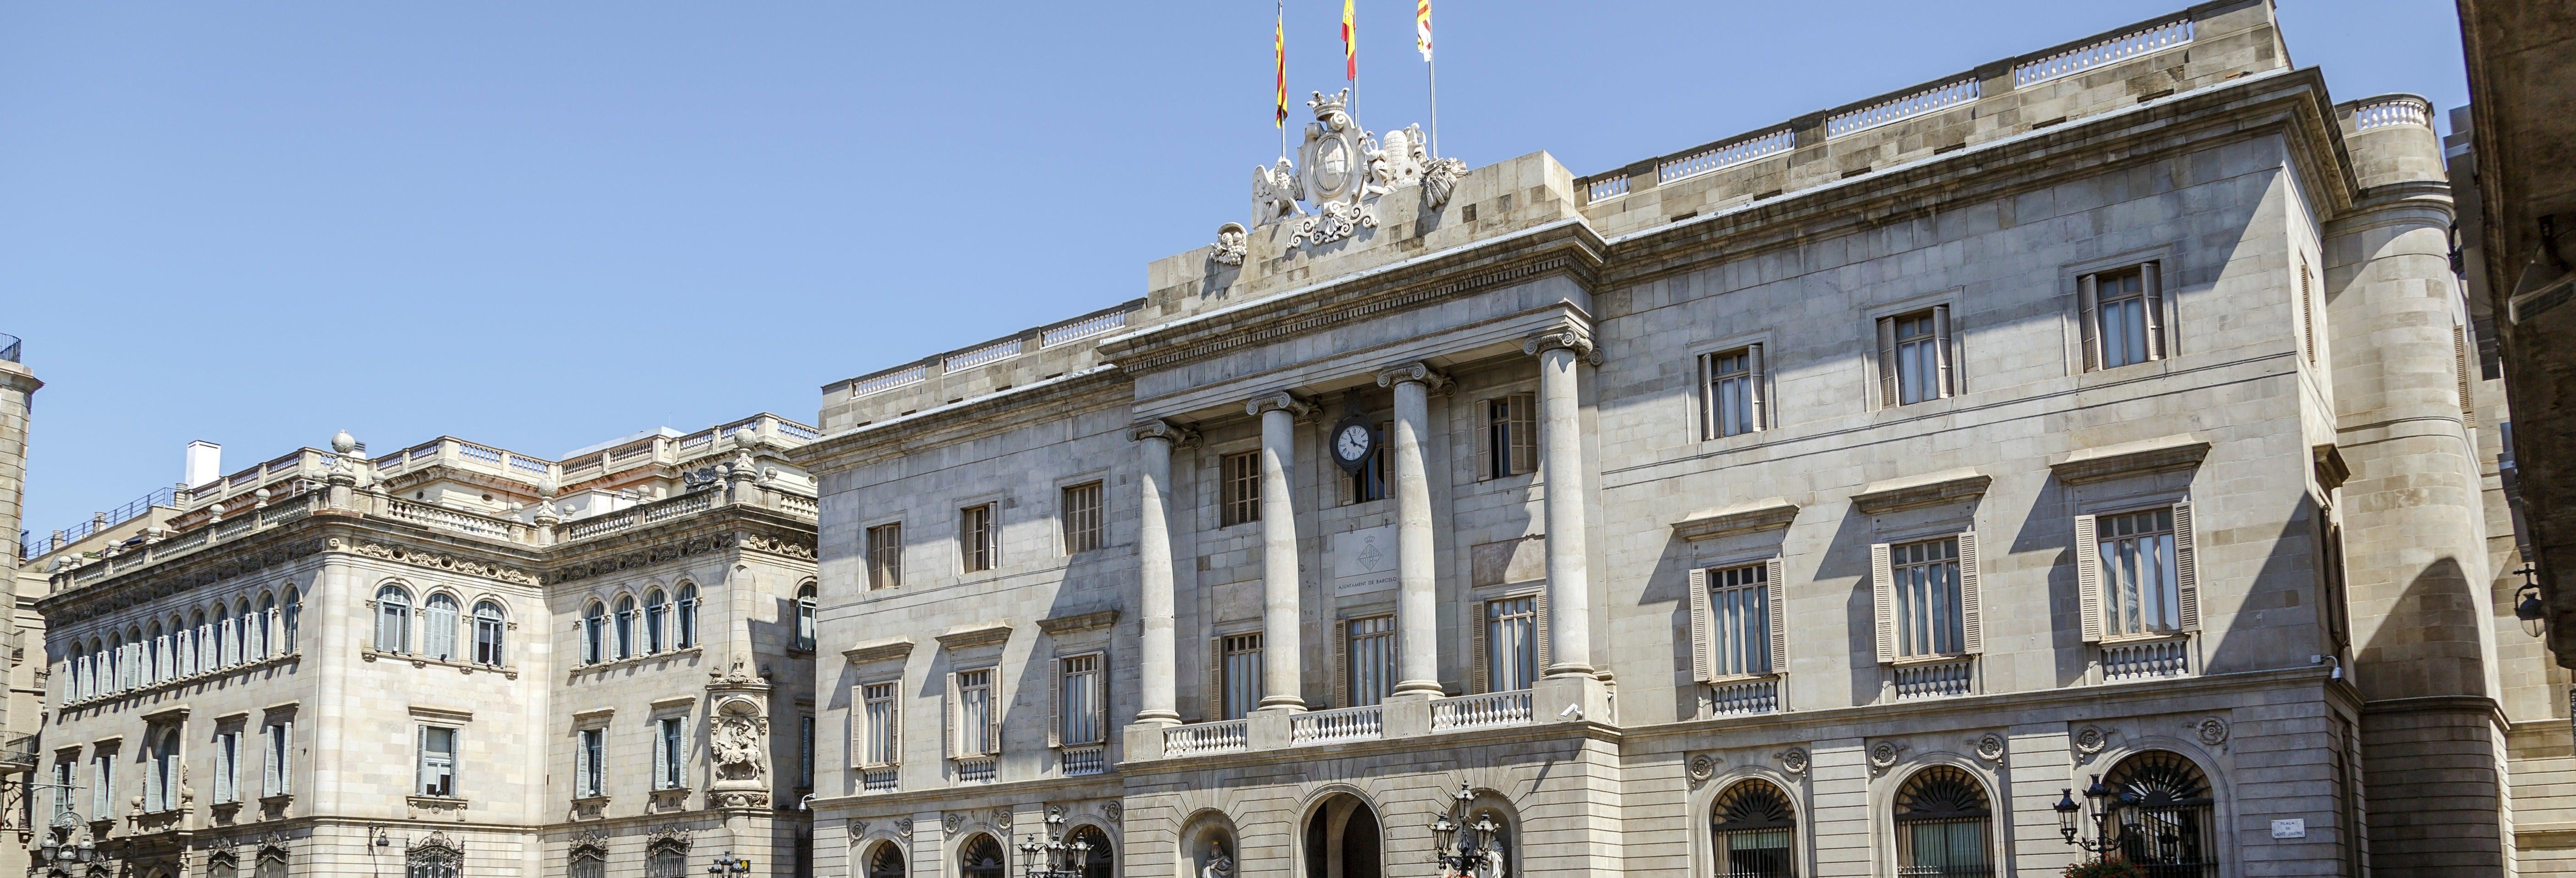 Visite du Palau Güell, de Las Ramblas et du Marché de La Boquería